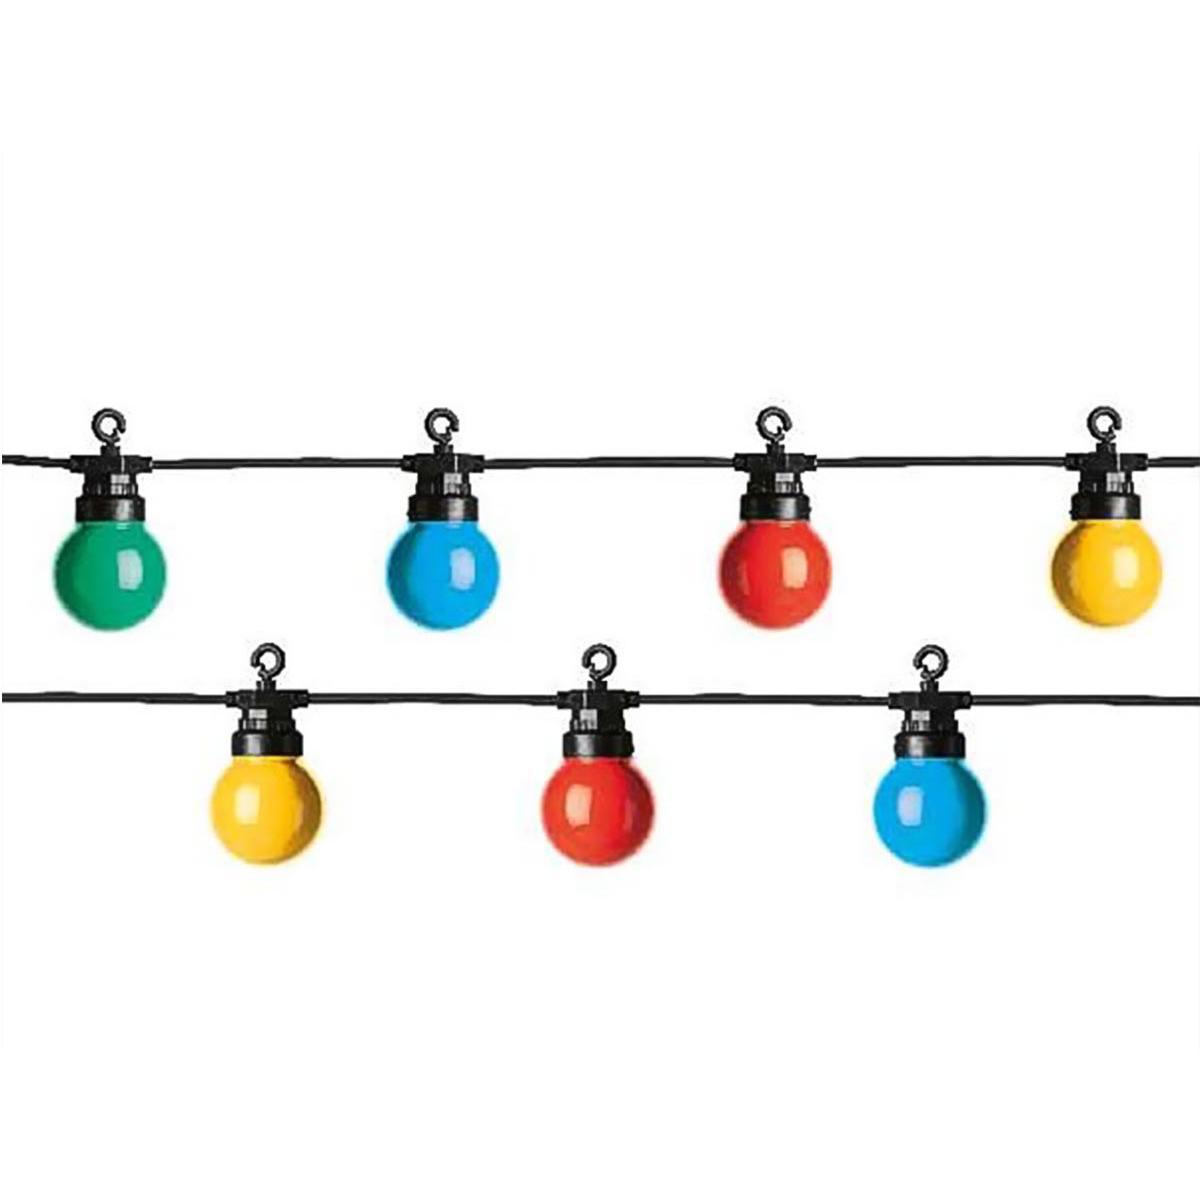 Jardideco Guirlande lumineuse 20 Led 8 fonctions - muticolore